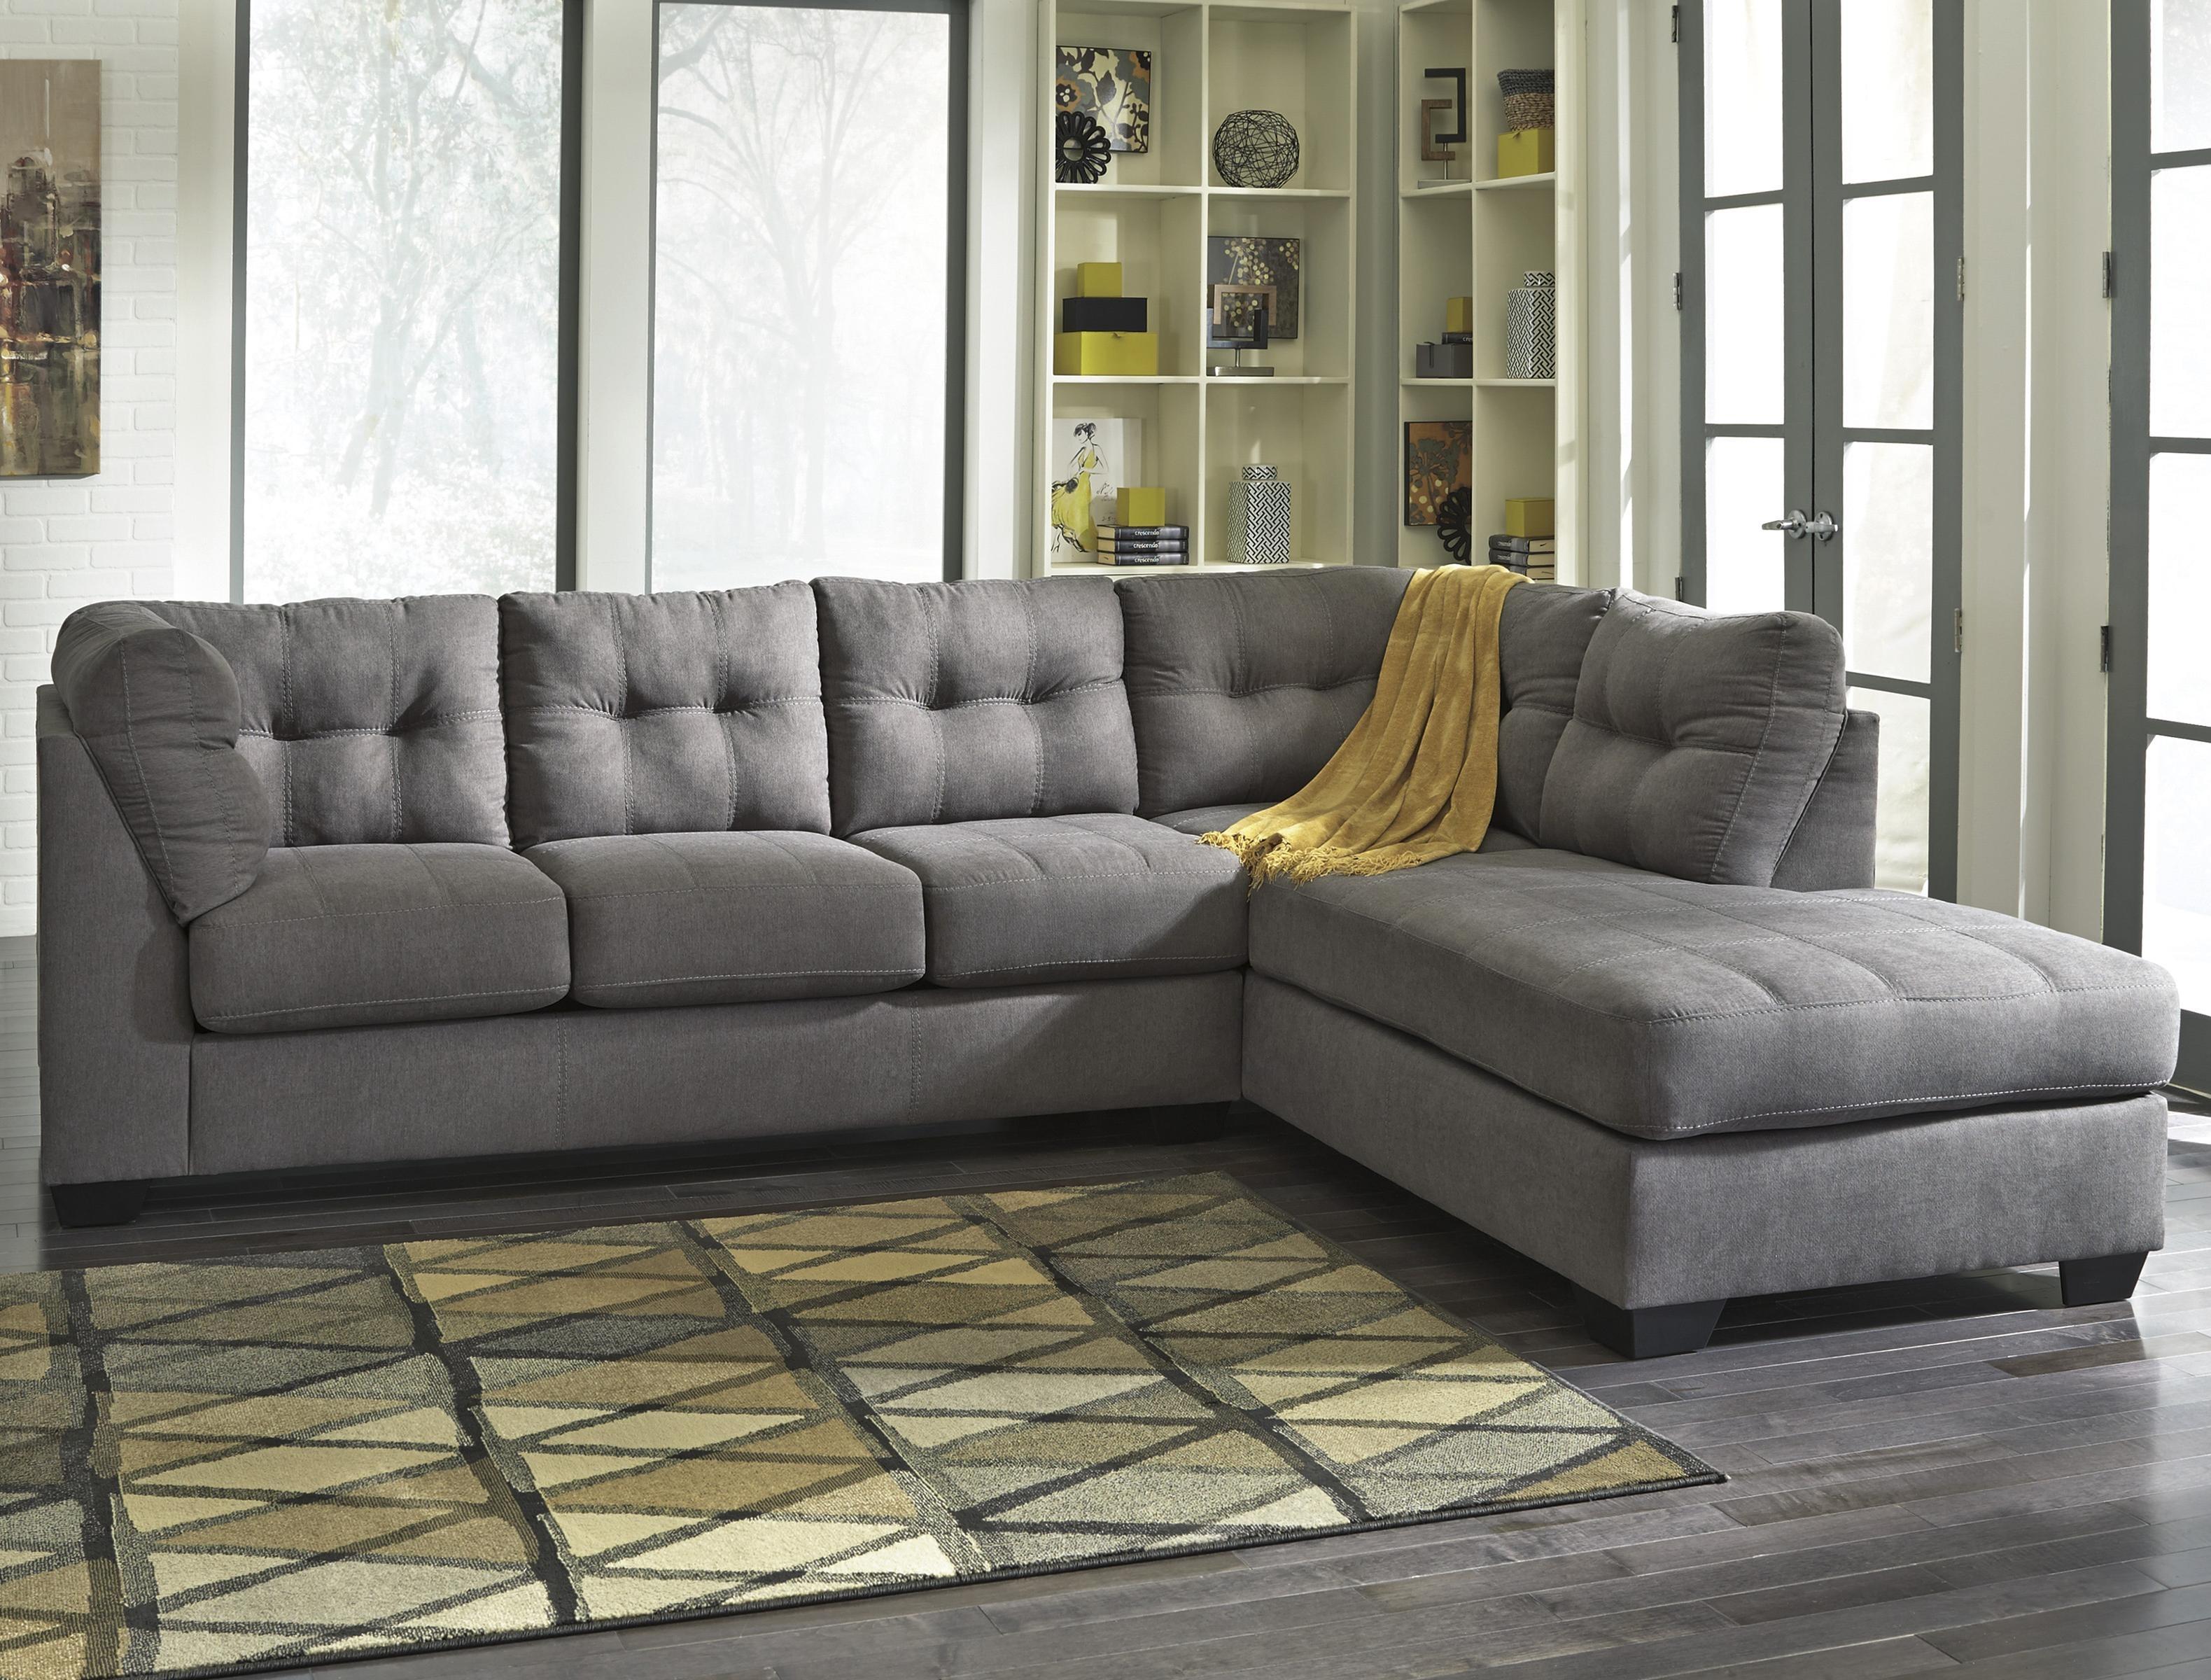 Luxury Sectional Sofas Portland Oregon 45 For Your Sectional Sofas Within Portland Oregon Sectional Sofas (Image 3 of 10)